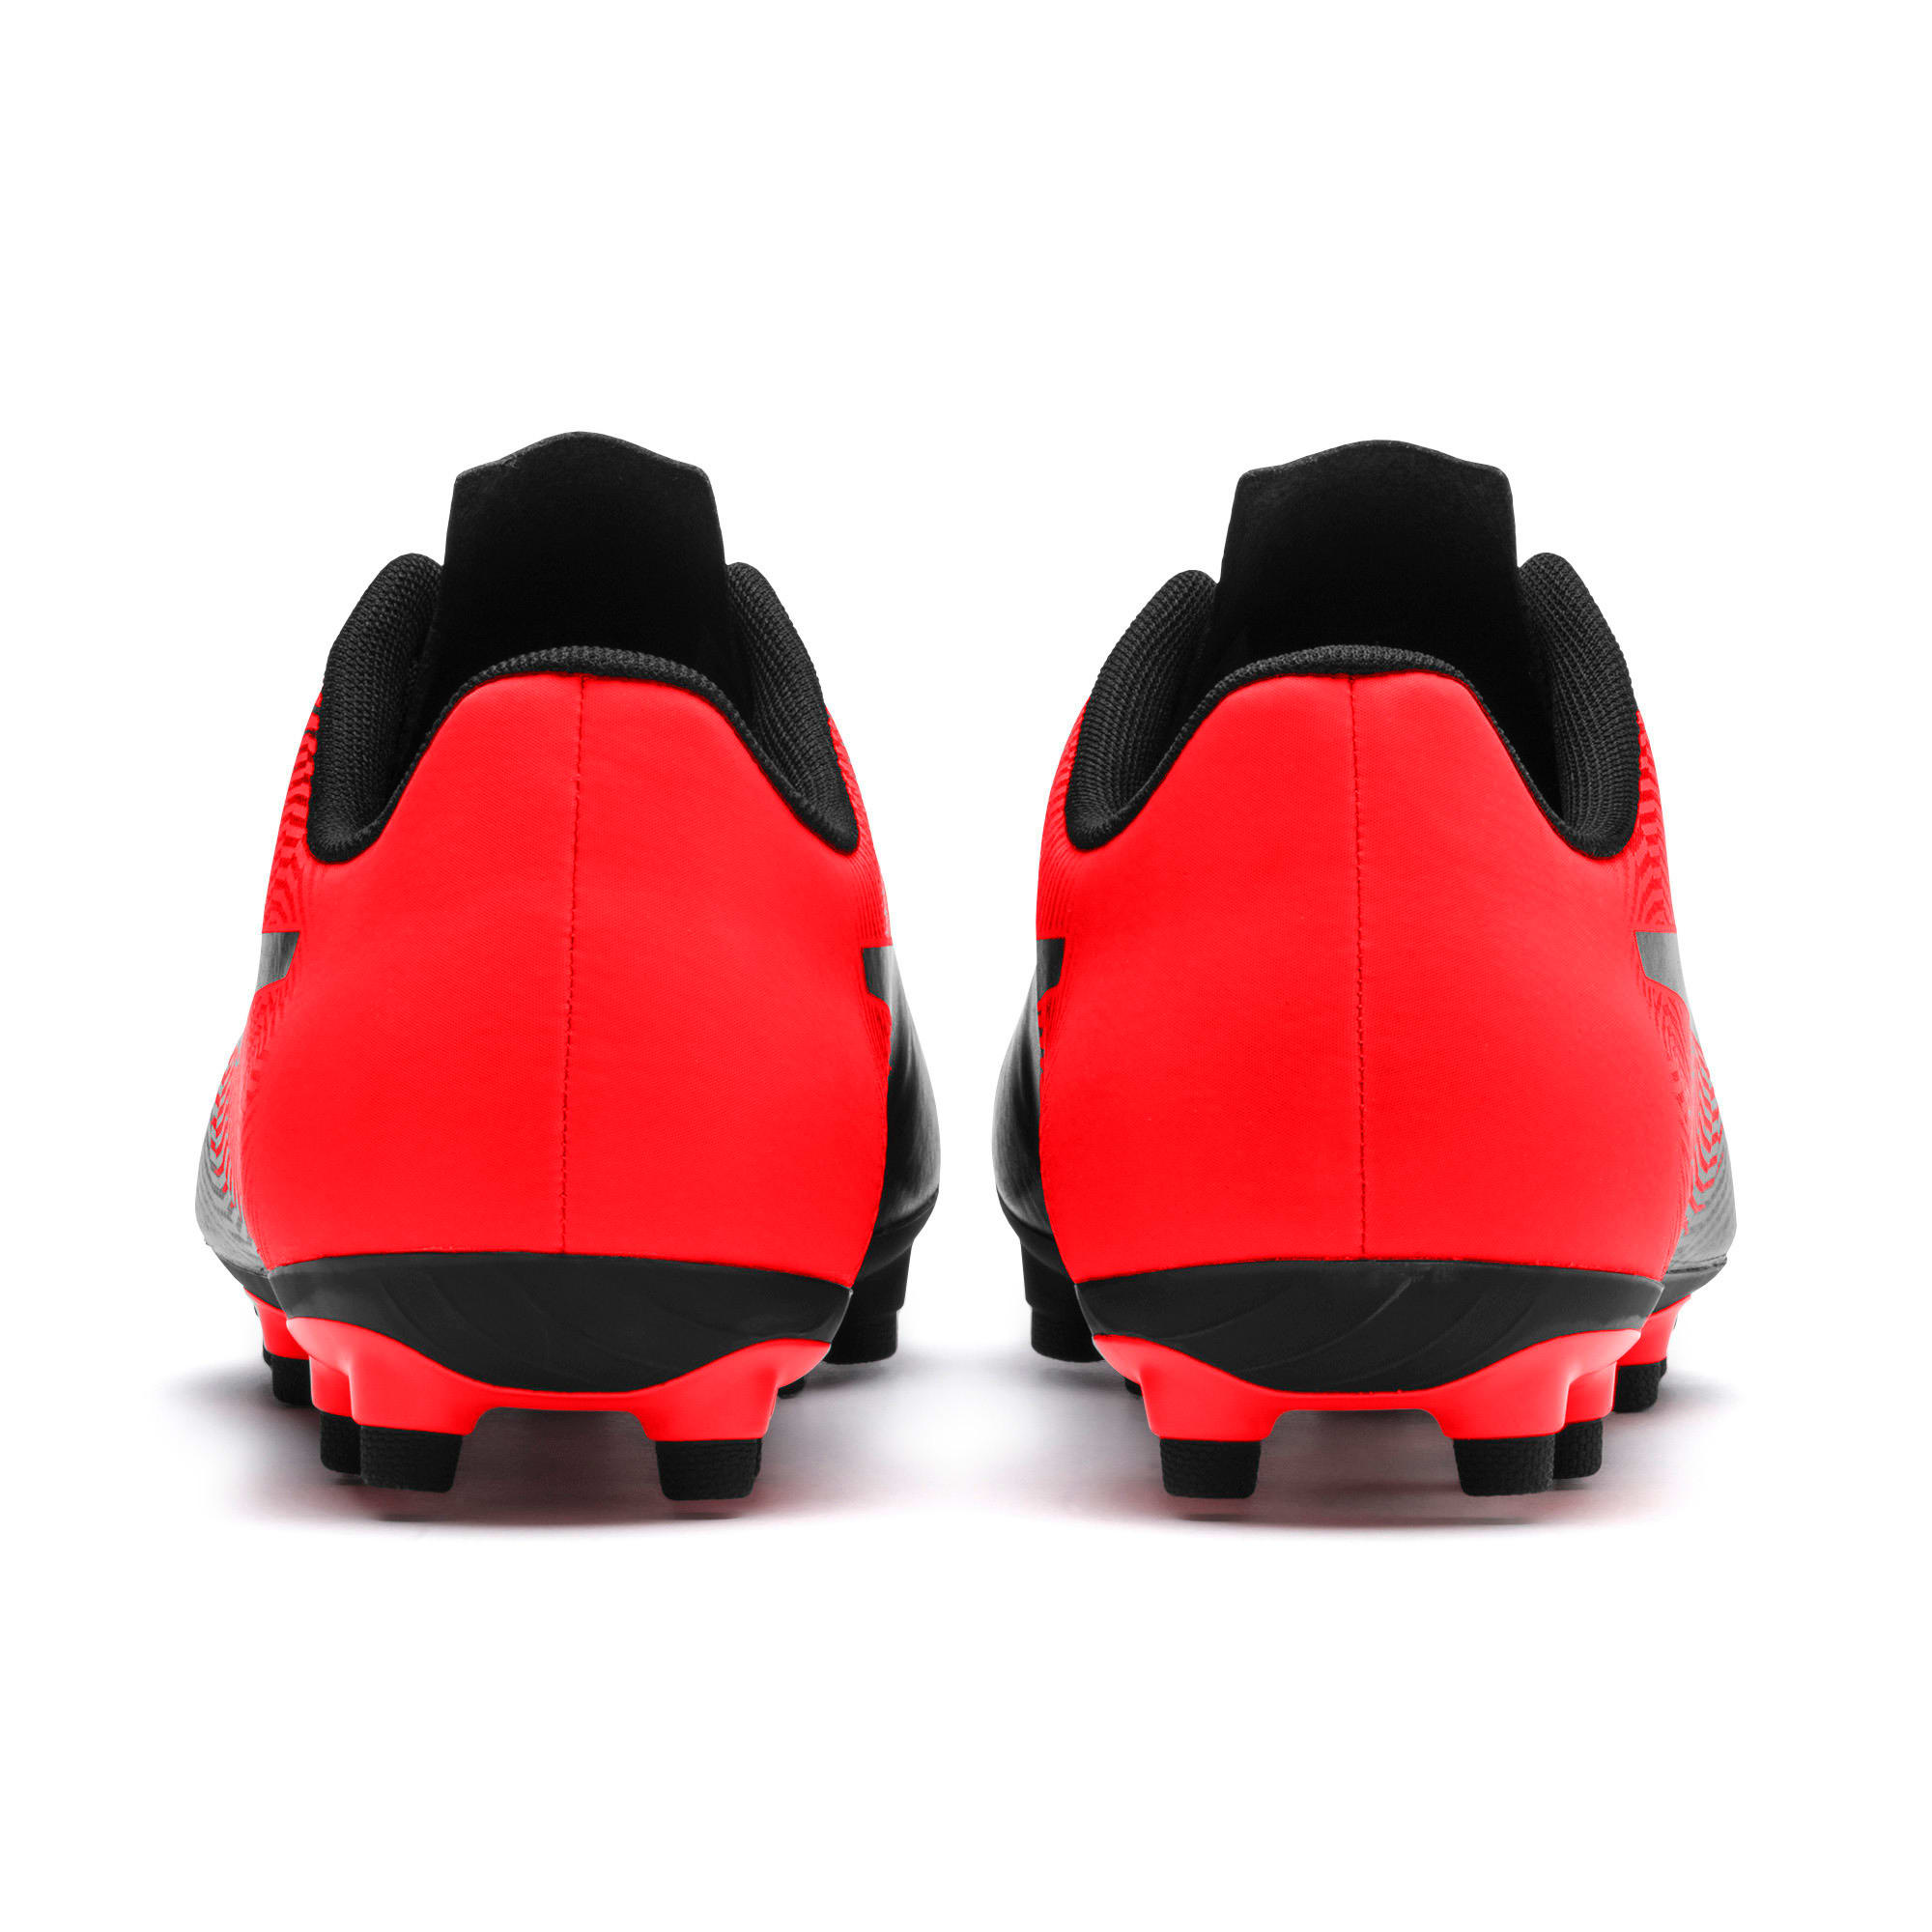 Thumbnail 4 of PUMA Spirit II FG Men's Soccer Cleats, Puma Black-Red Blast, medium